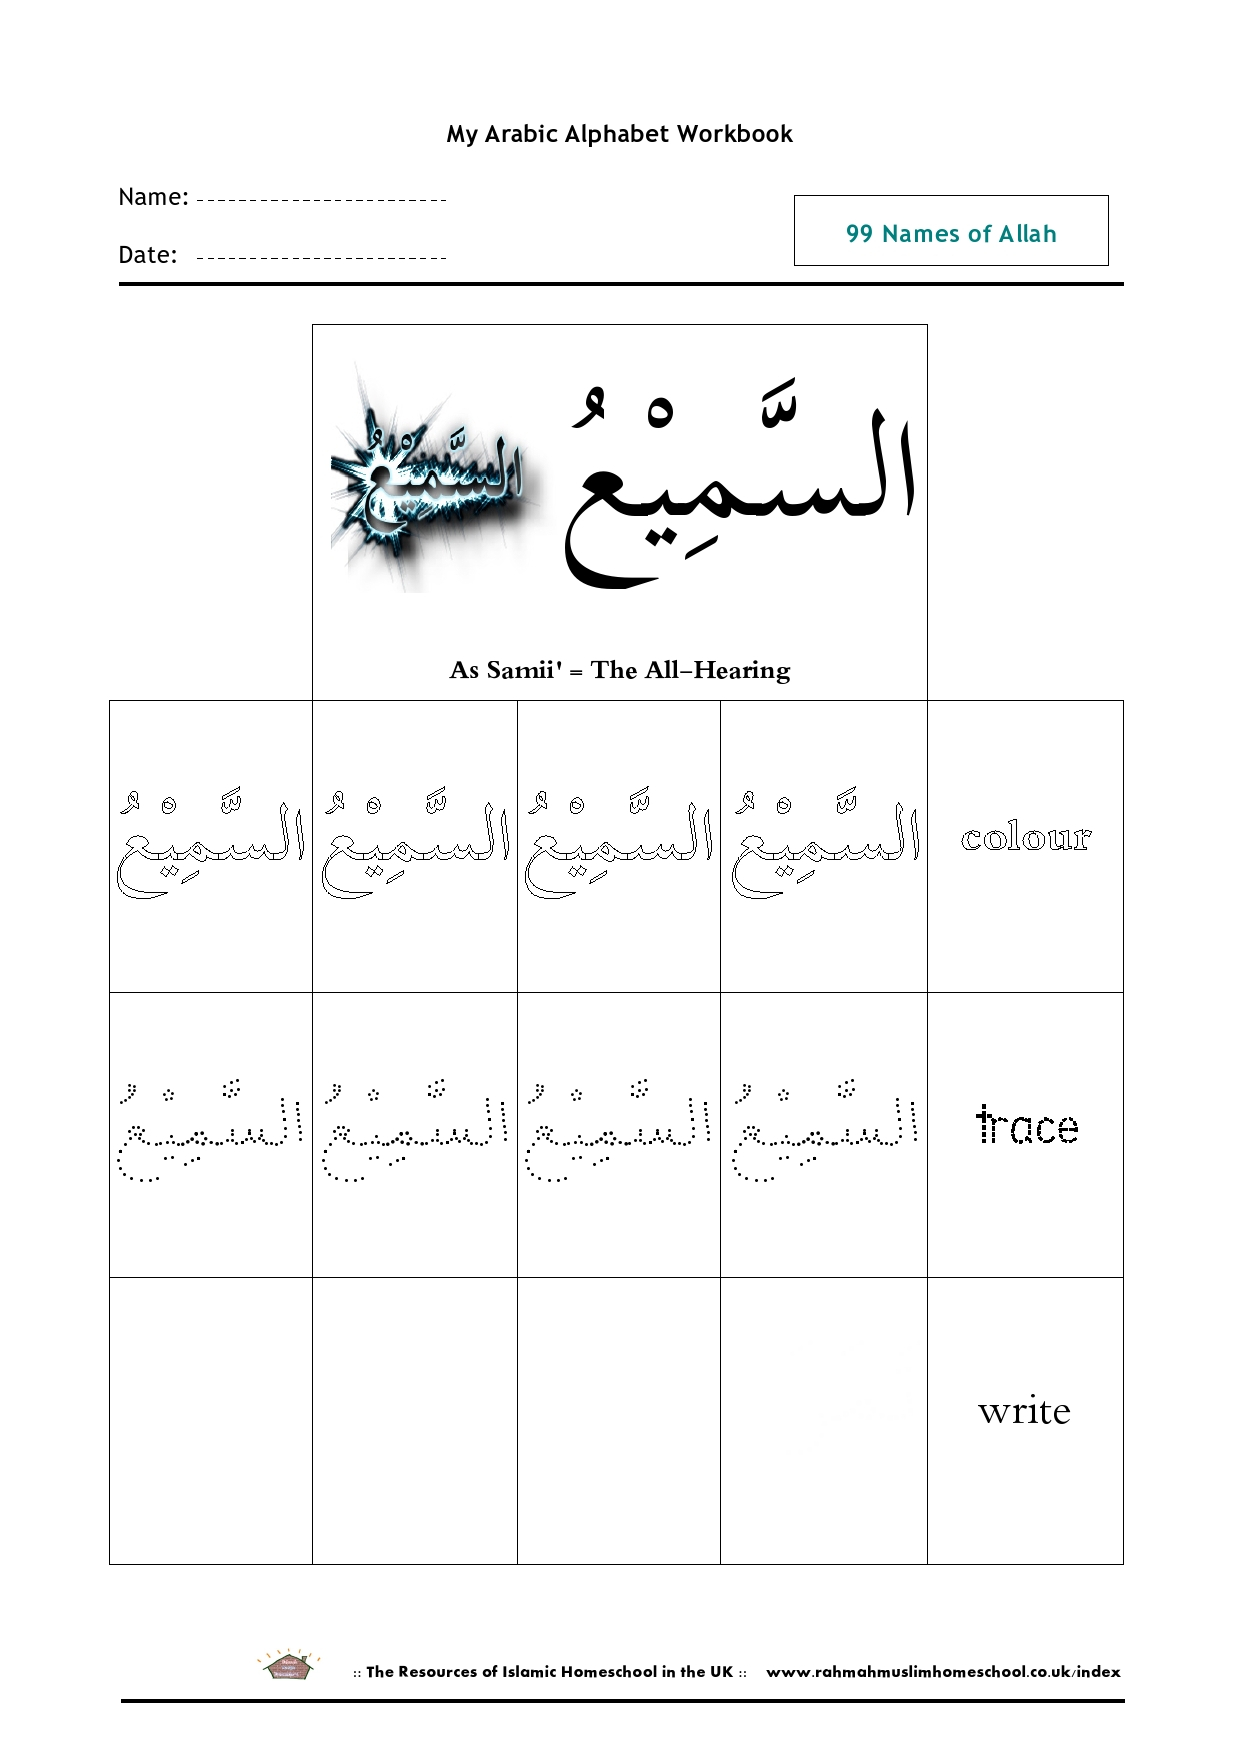 Free Arabic Worksheet; The 99 Names Of Allah, As Samii